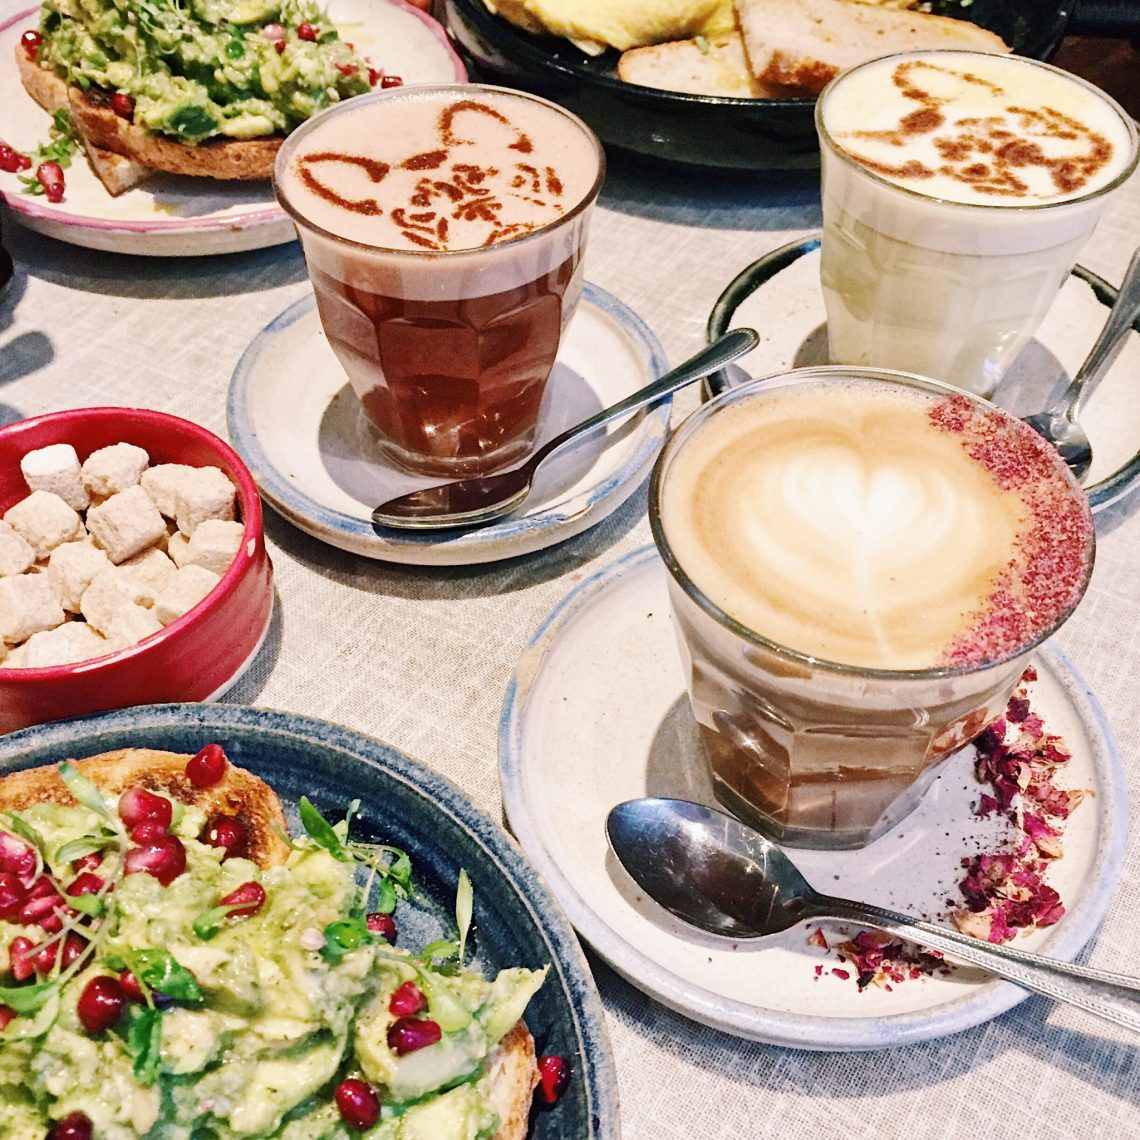 farm girl cafe london french bulldog latte